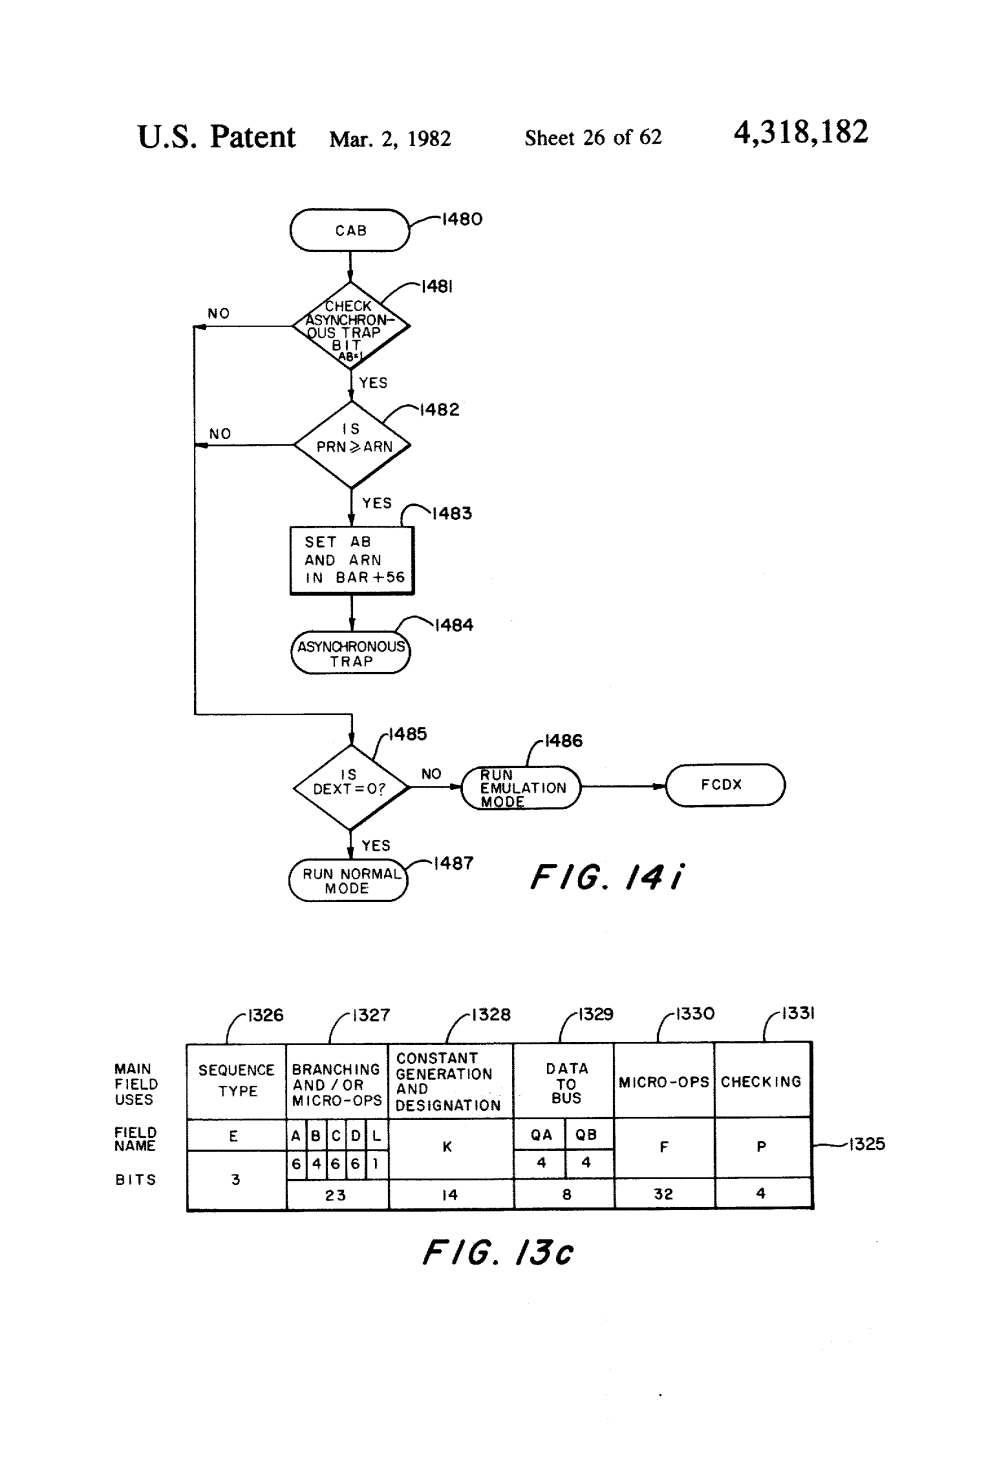 medium resolution of 1996 polaris xplorer 400 wiring diagram wiring diagrams 2000 polaris 400 explorer at 1996 polaris xplorer